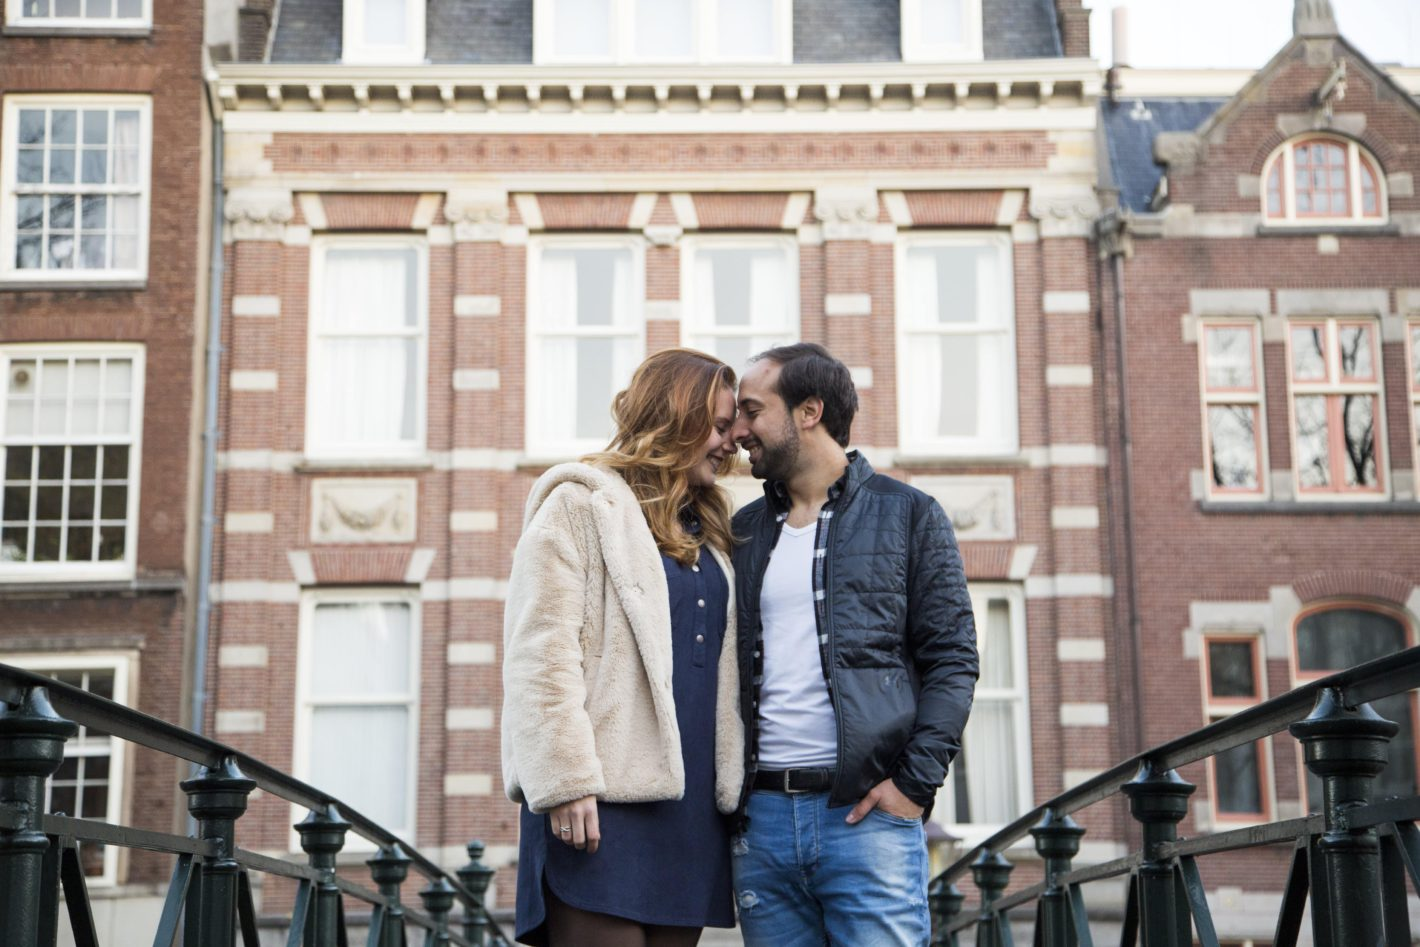 Wedding Martin & Savannah | An Amsterdam Wedding